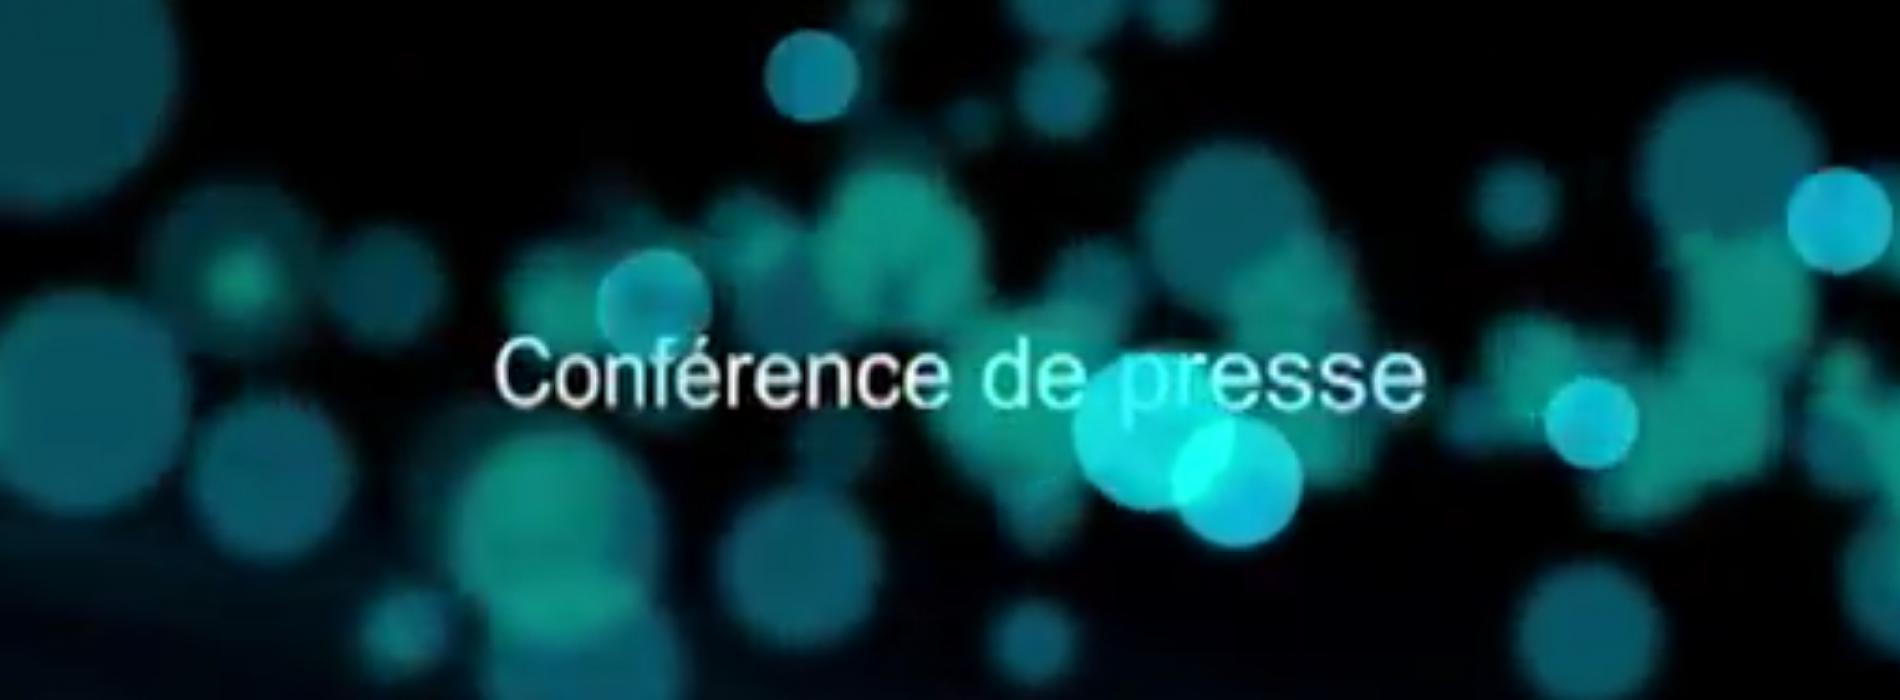 conference-de-presse